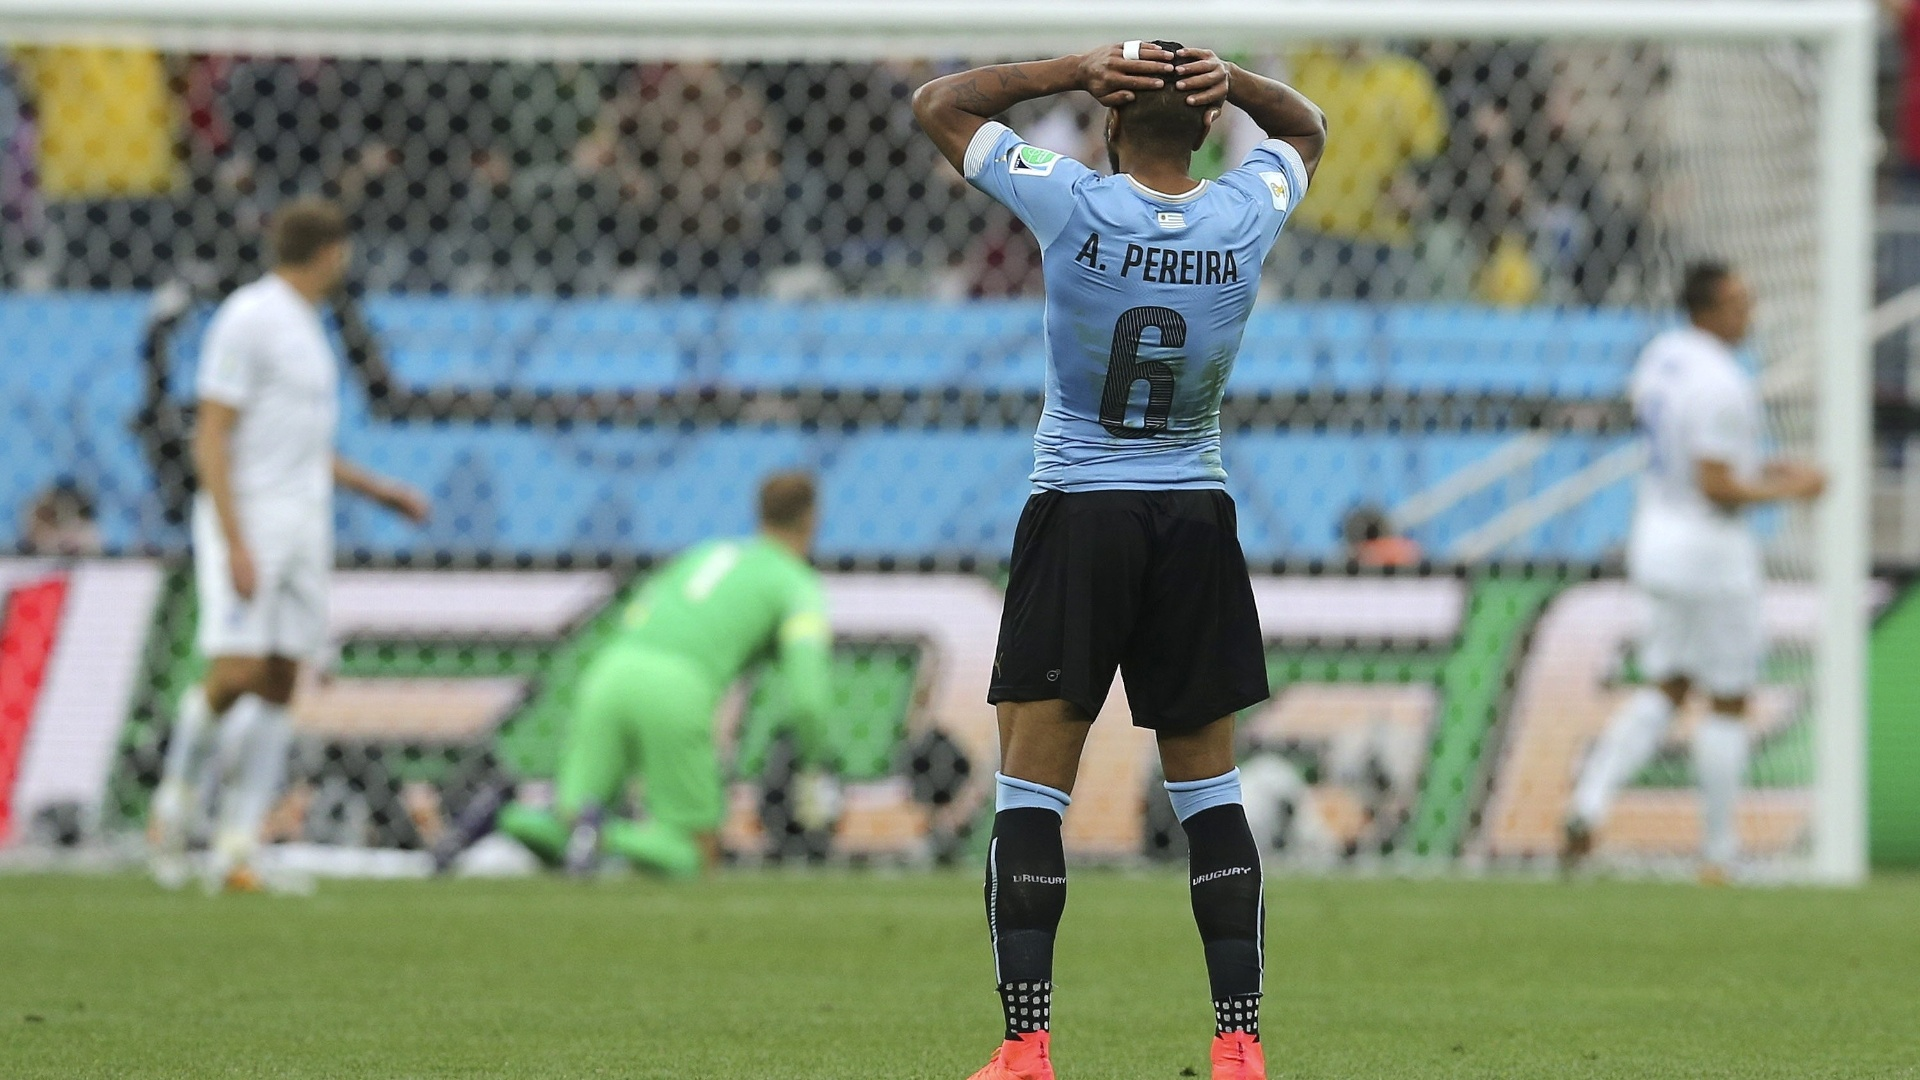 19.jun.2014 - Lateral Álvaro Pereira leva as mãos à cabeça após ver o Uruguai perder chance de gol contra a Inglaterra